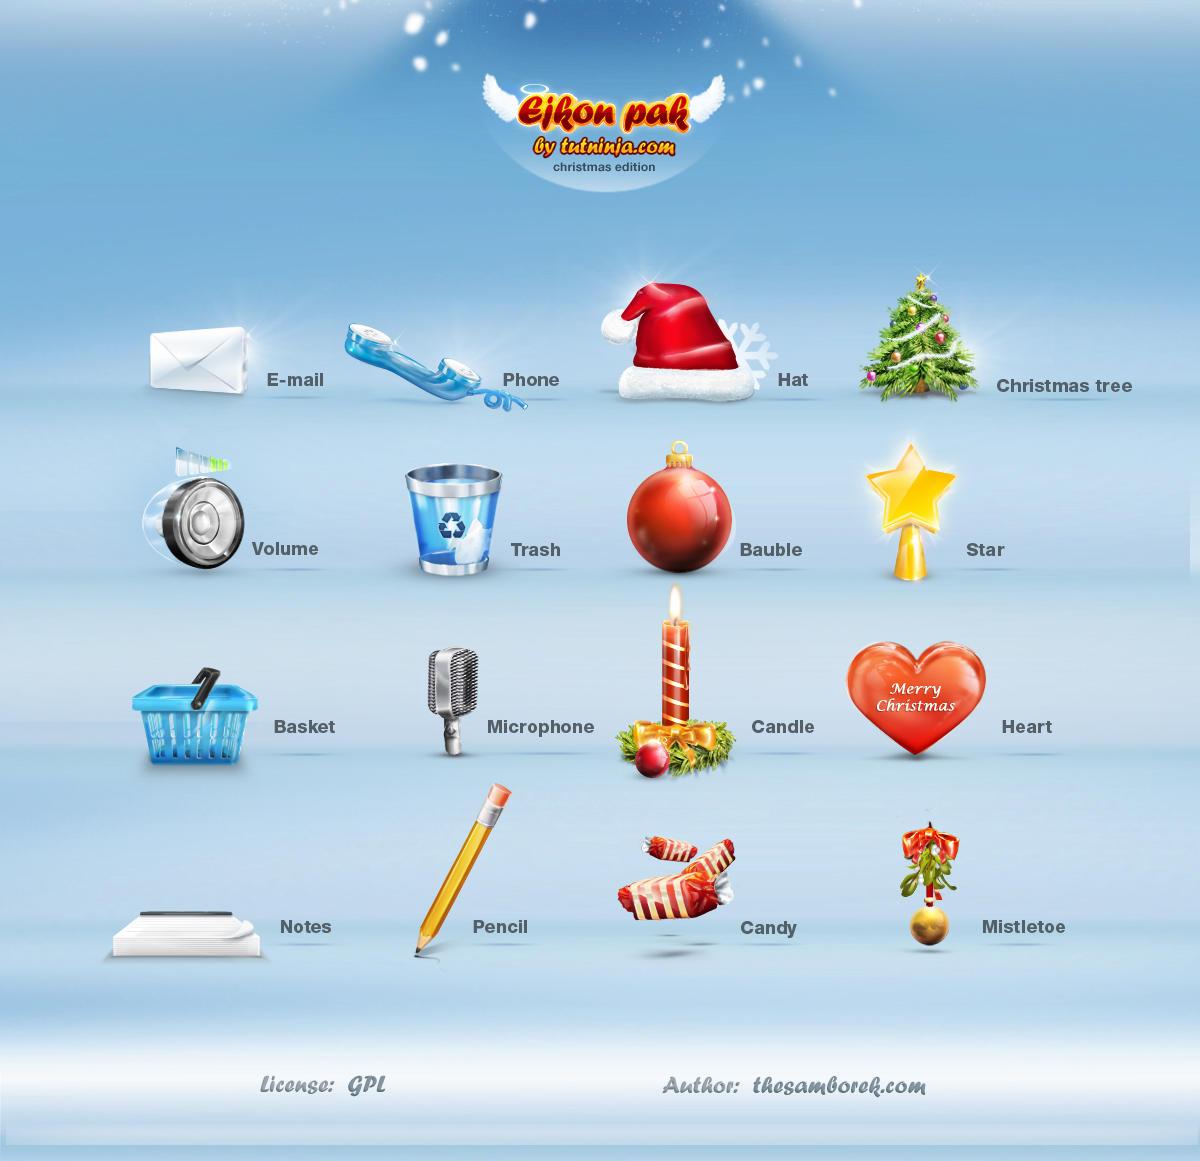 Christmas Icon Set no.1 by samborek